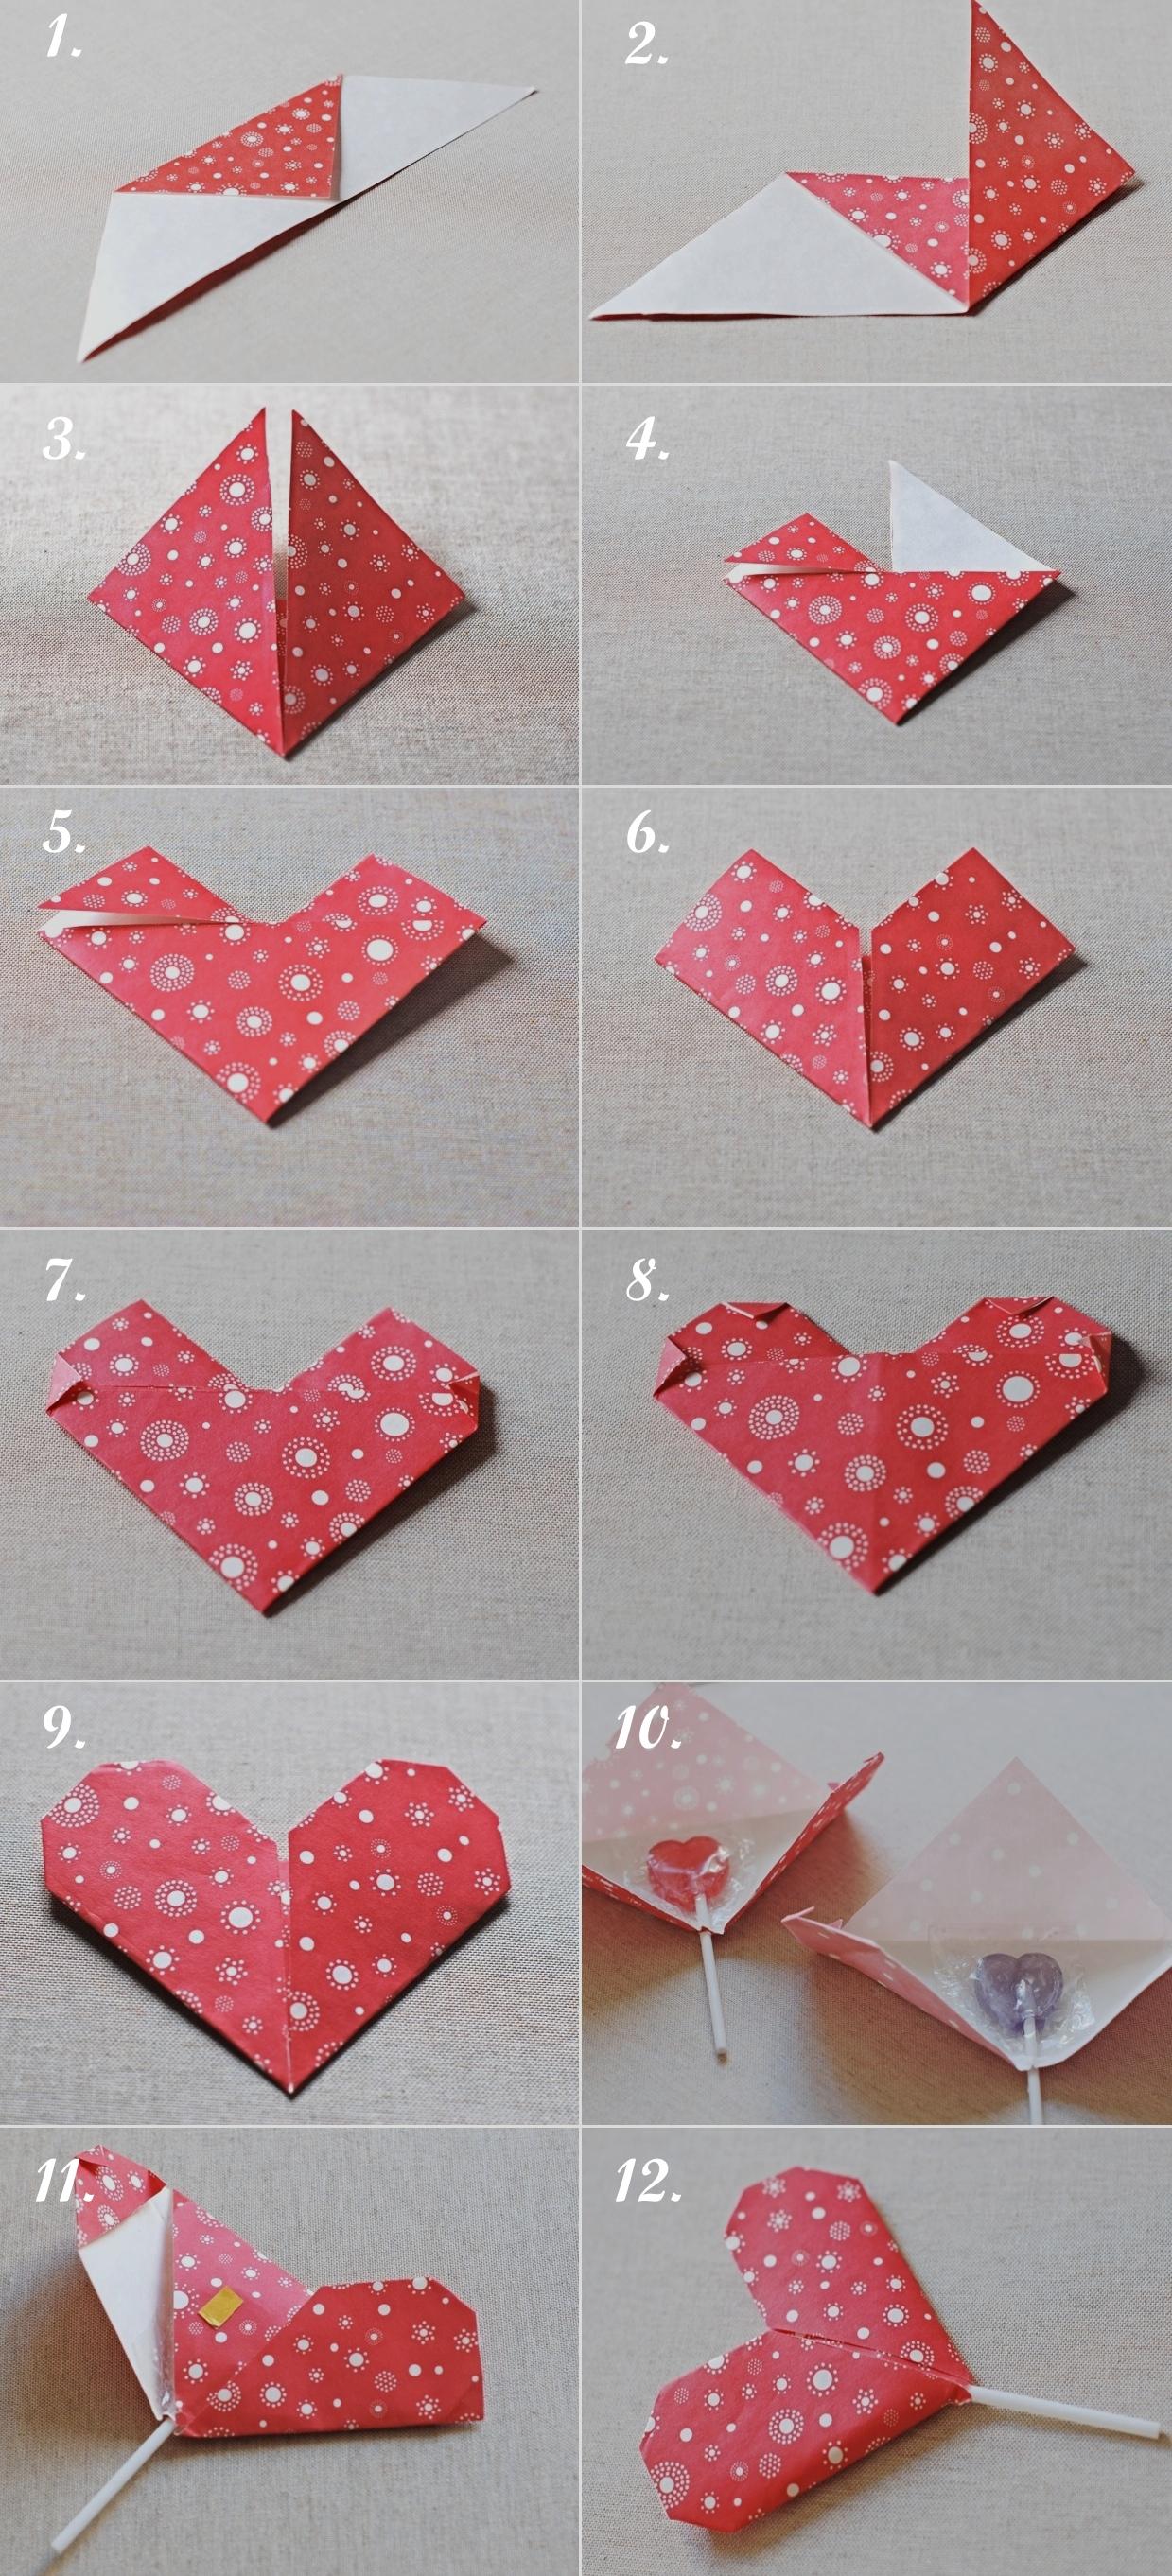 http://akissofcolour.com/2012/02/diy-14-corazones-para-san-valentin-valentines-hearts/